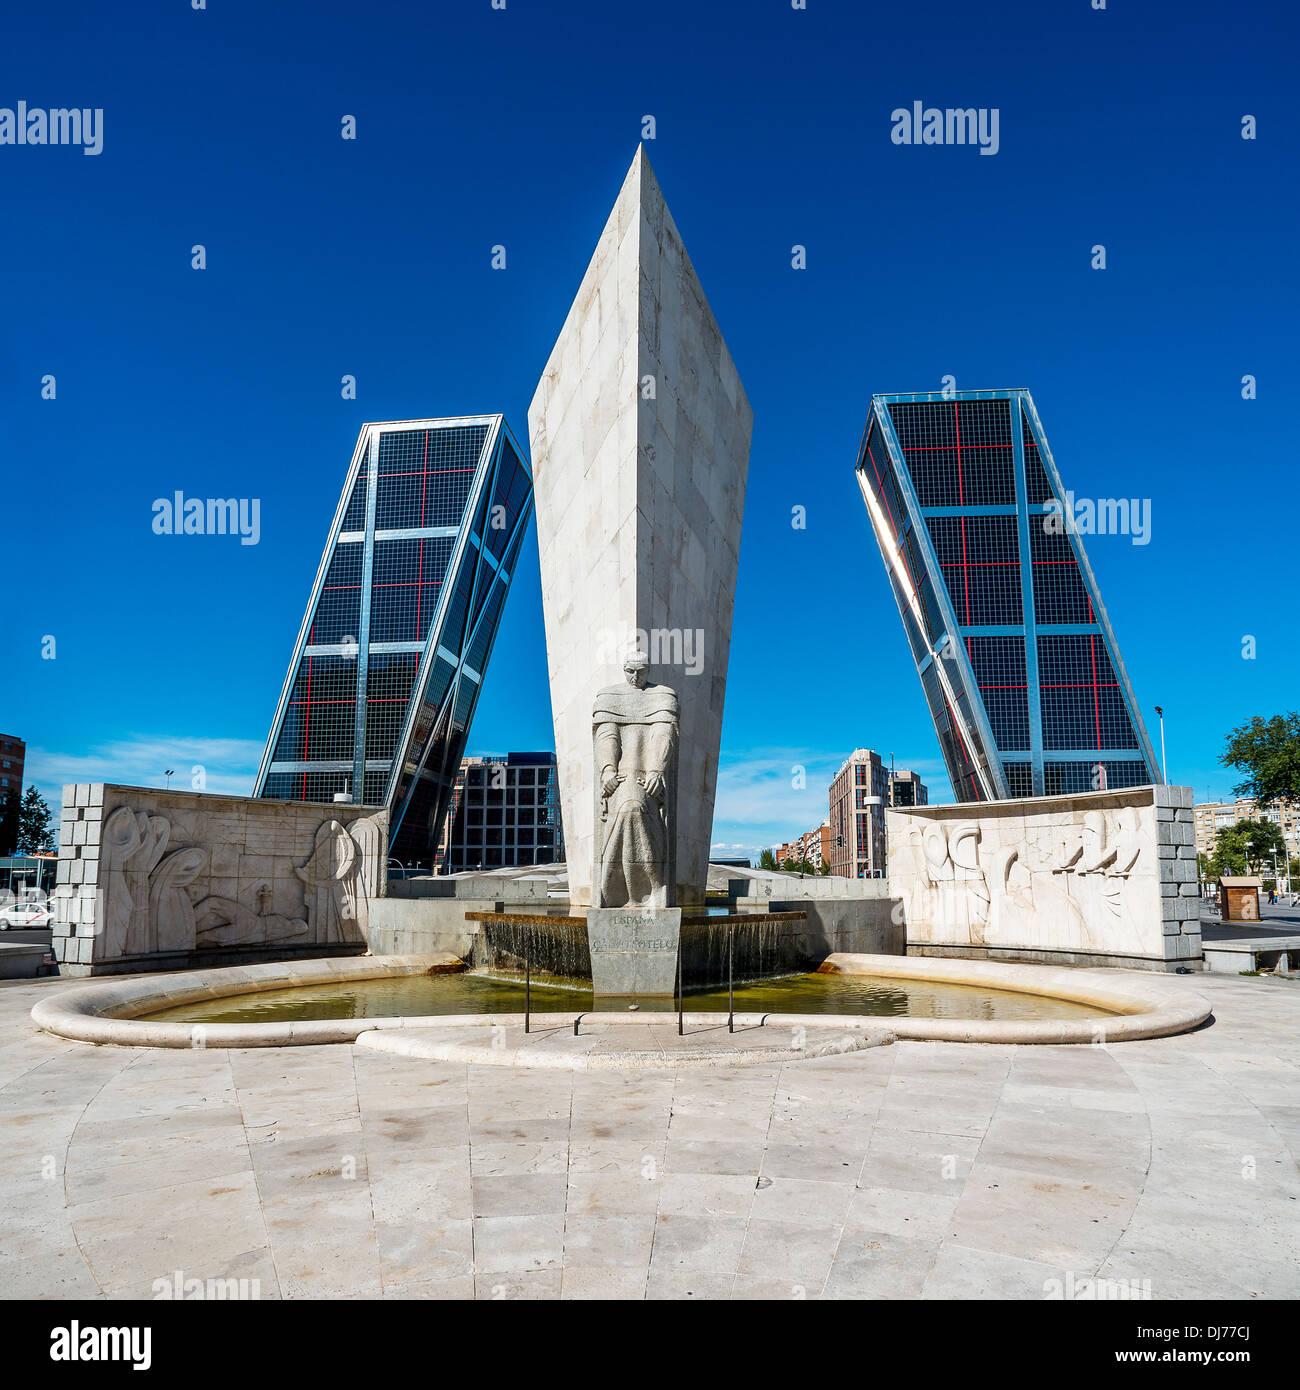 Torres Kio in Madrid (Spain) - Plaza de Castilla - Stock Image